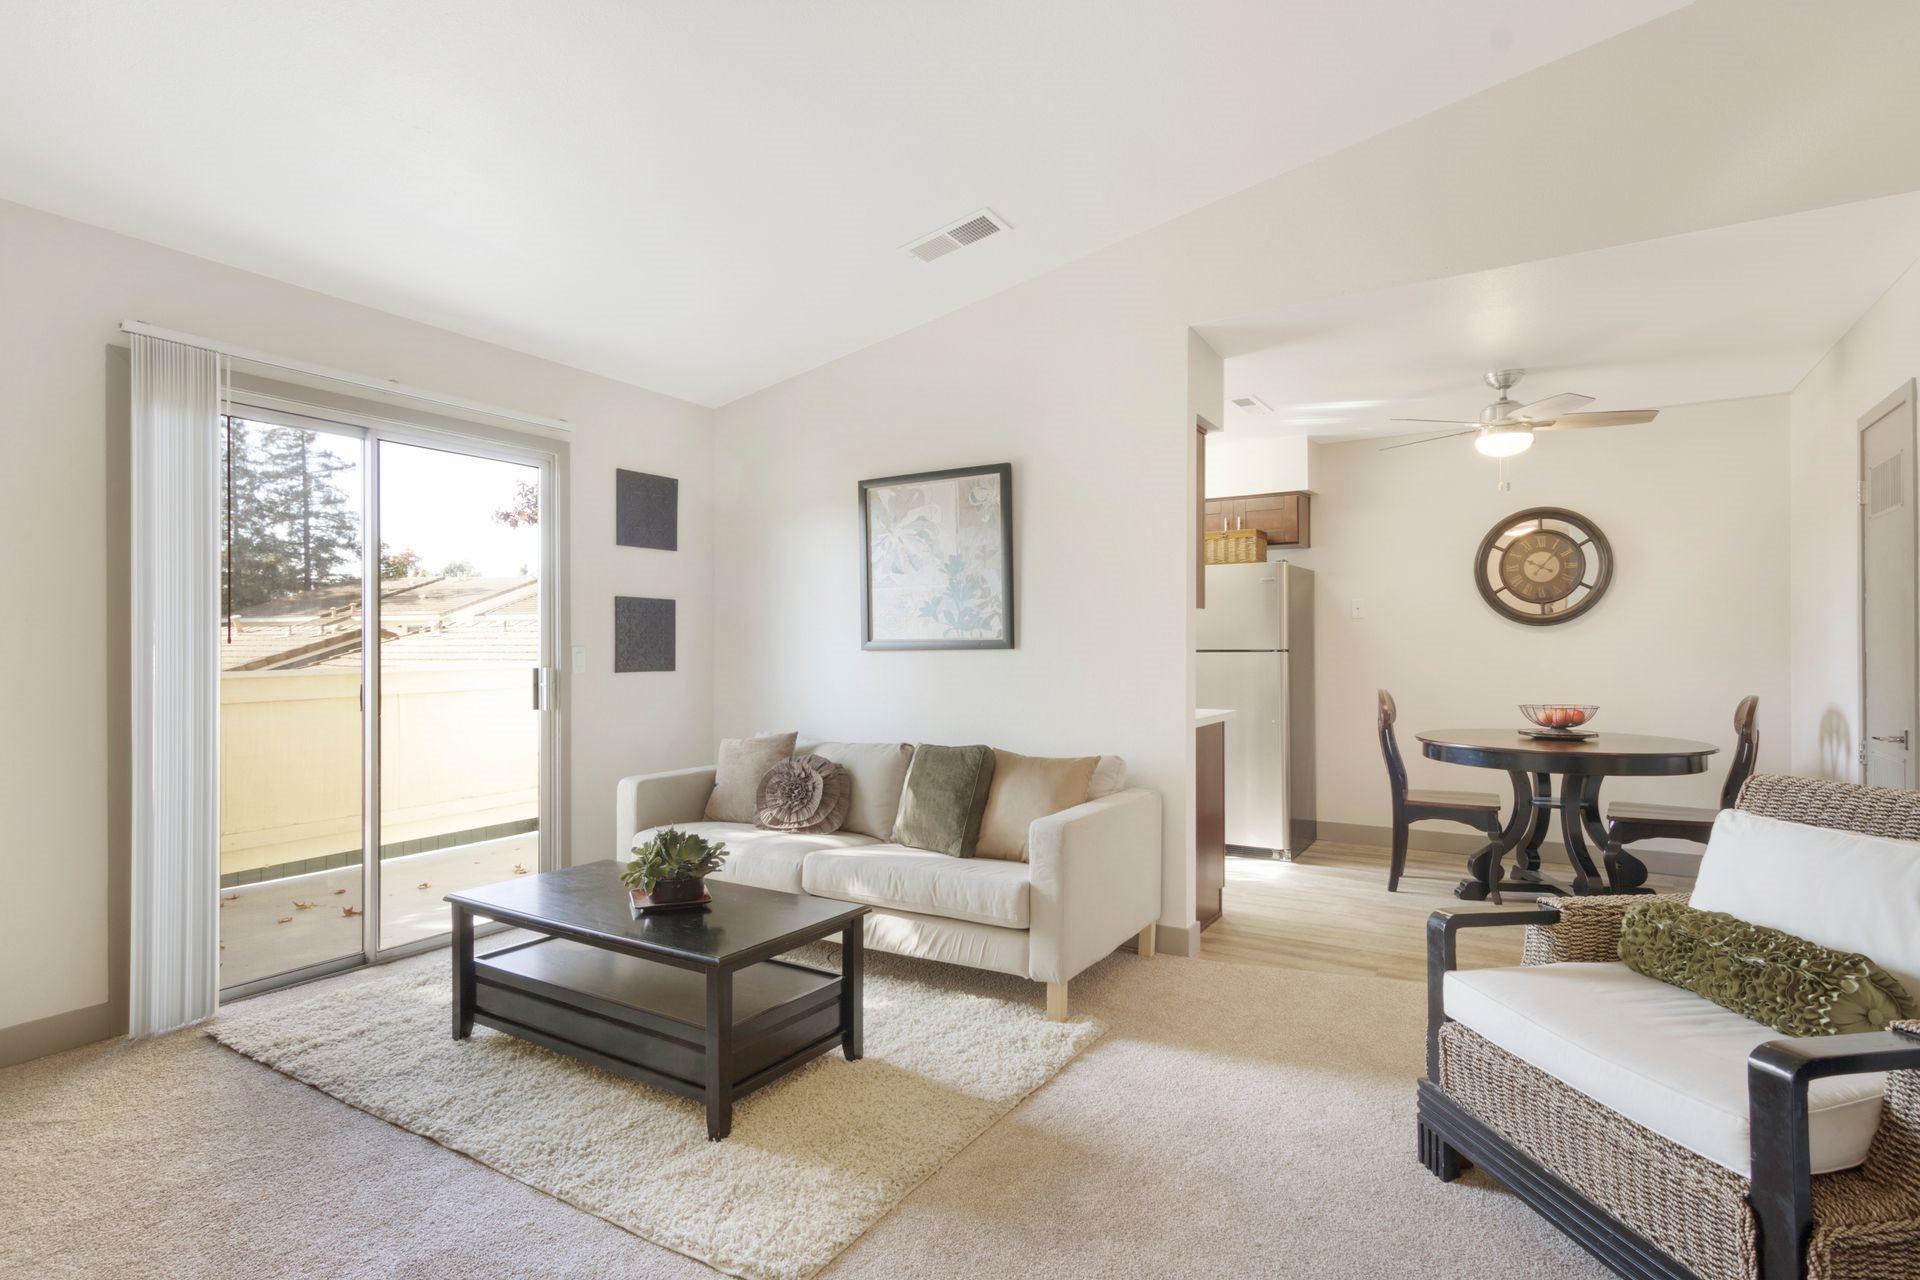 Northwood Village Short Term Stay-Sample Image of Merced CA Intern Rental